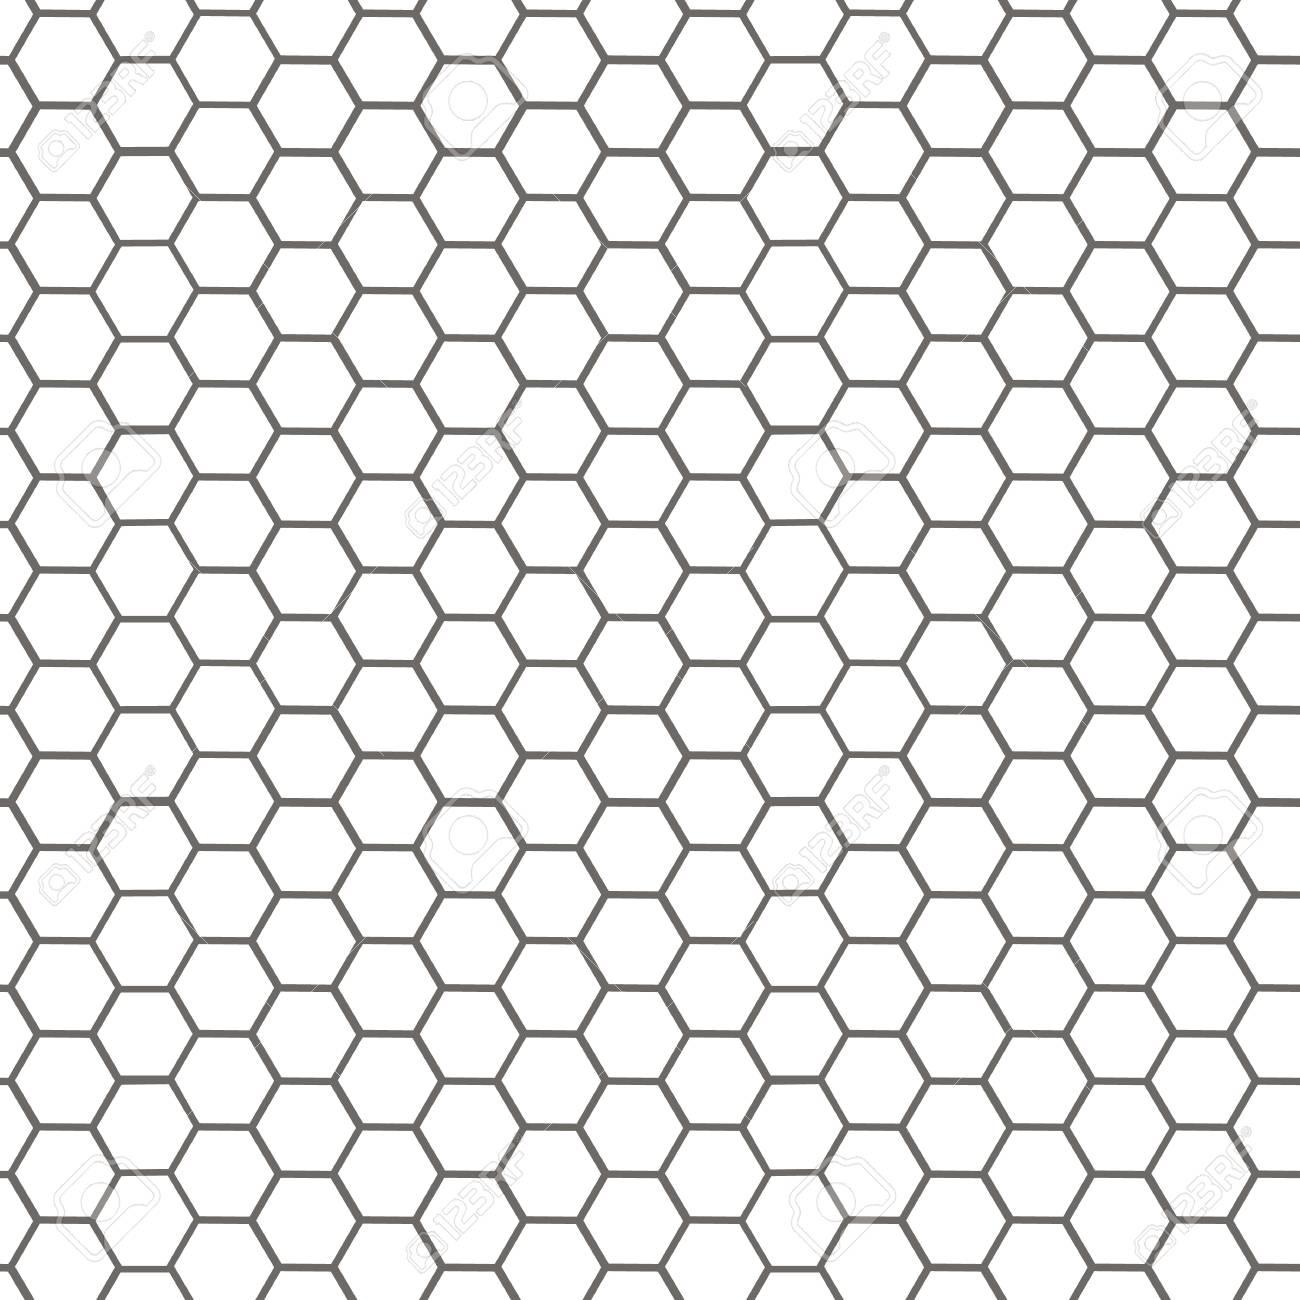 Circular honeycomb background elliptic gradient royalty free circular honeycomb background elliptic gradient stock vector 93857755 voltagebd Image collections